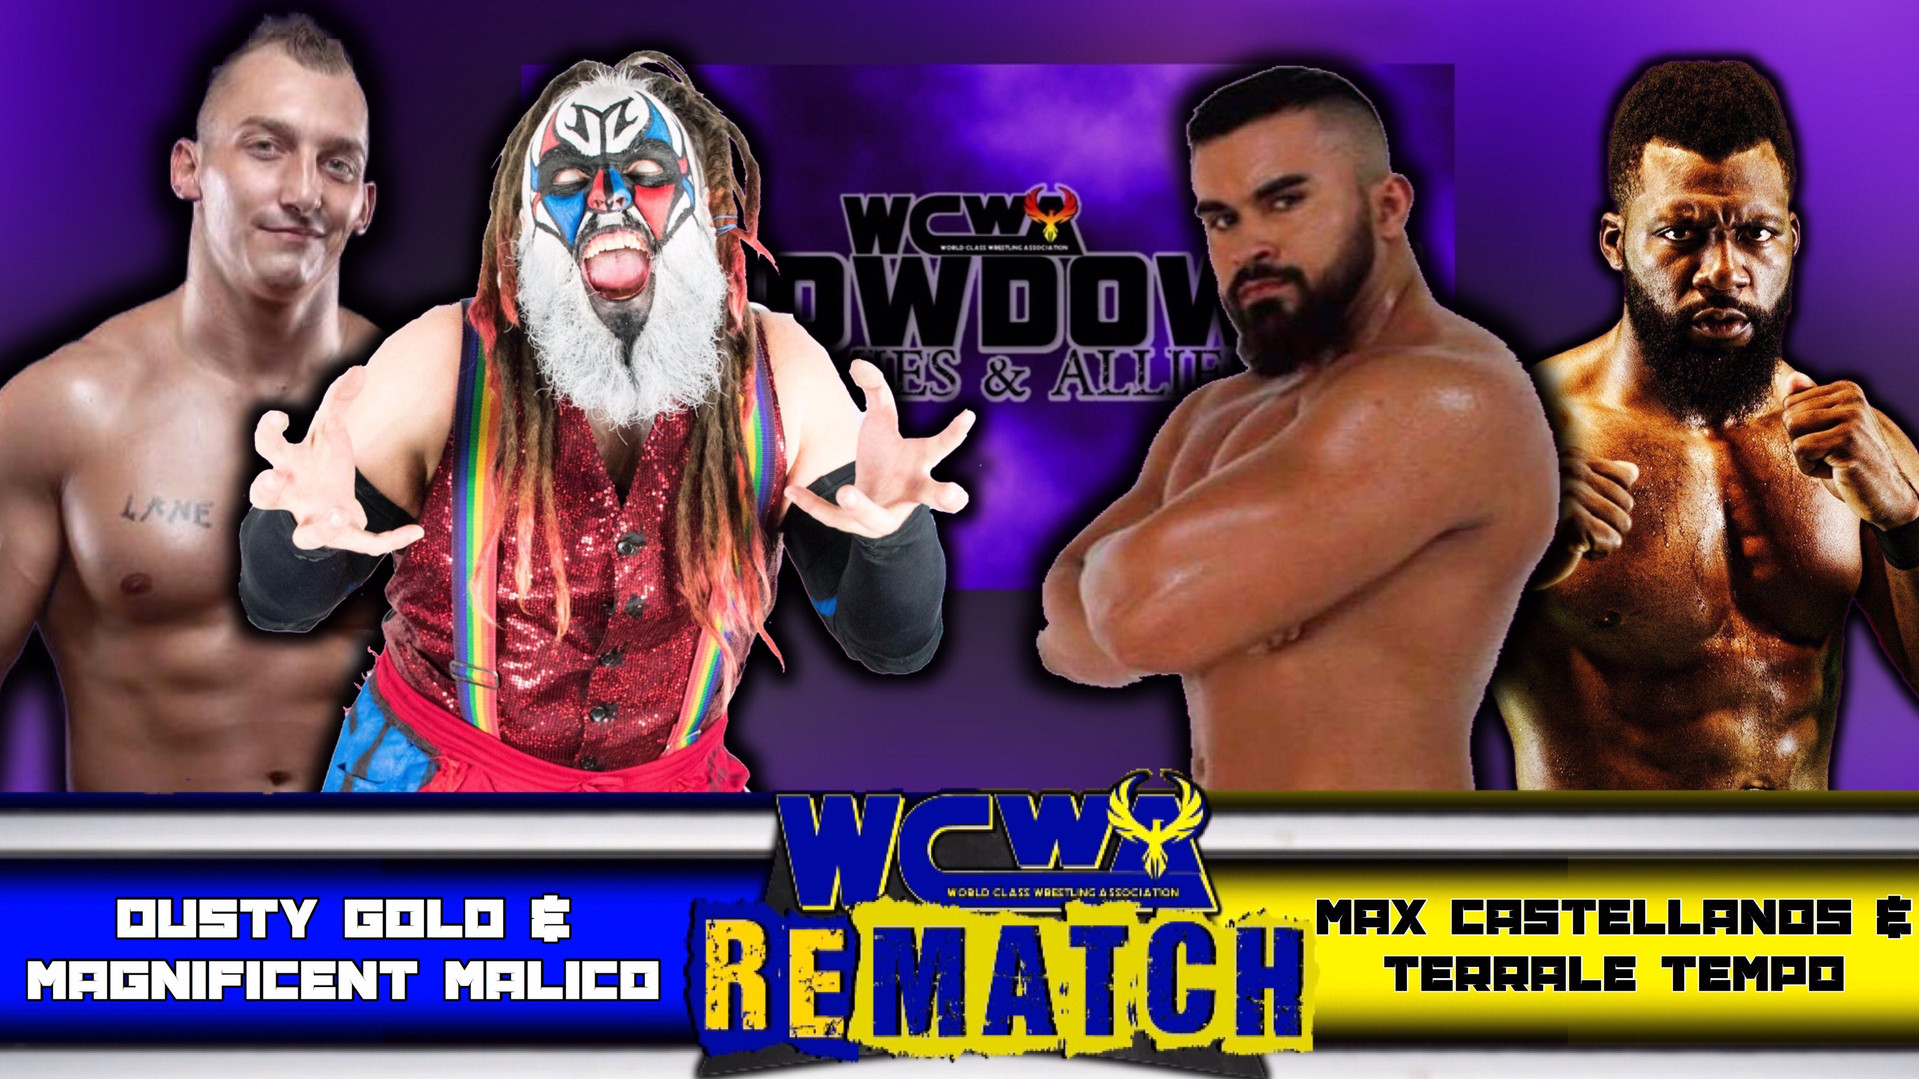 Gold N Clown Connection vs Terrale Tempo & Max Castellanos